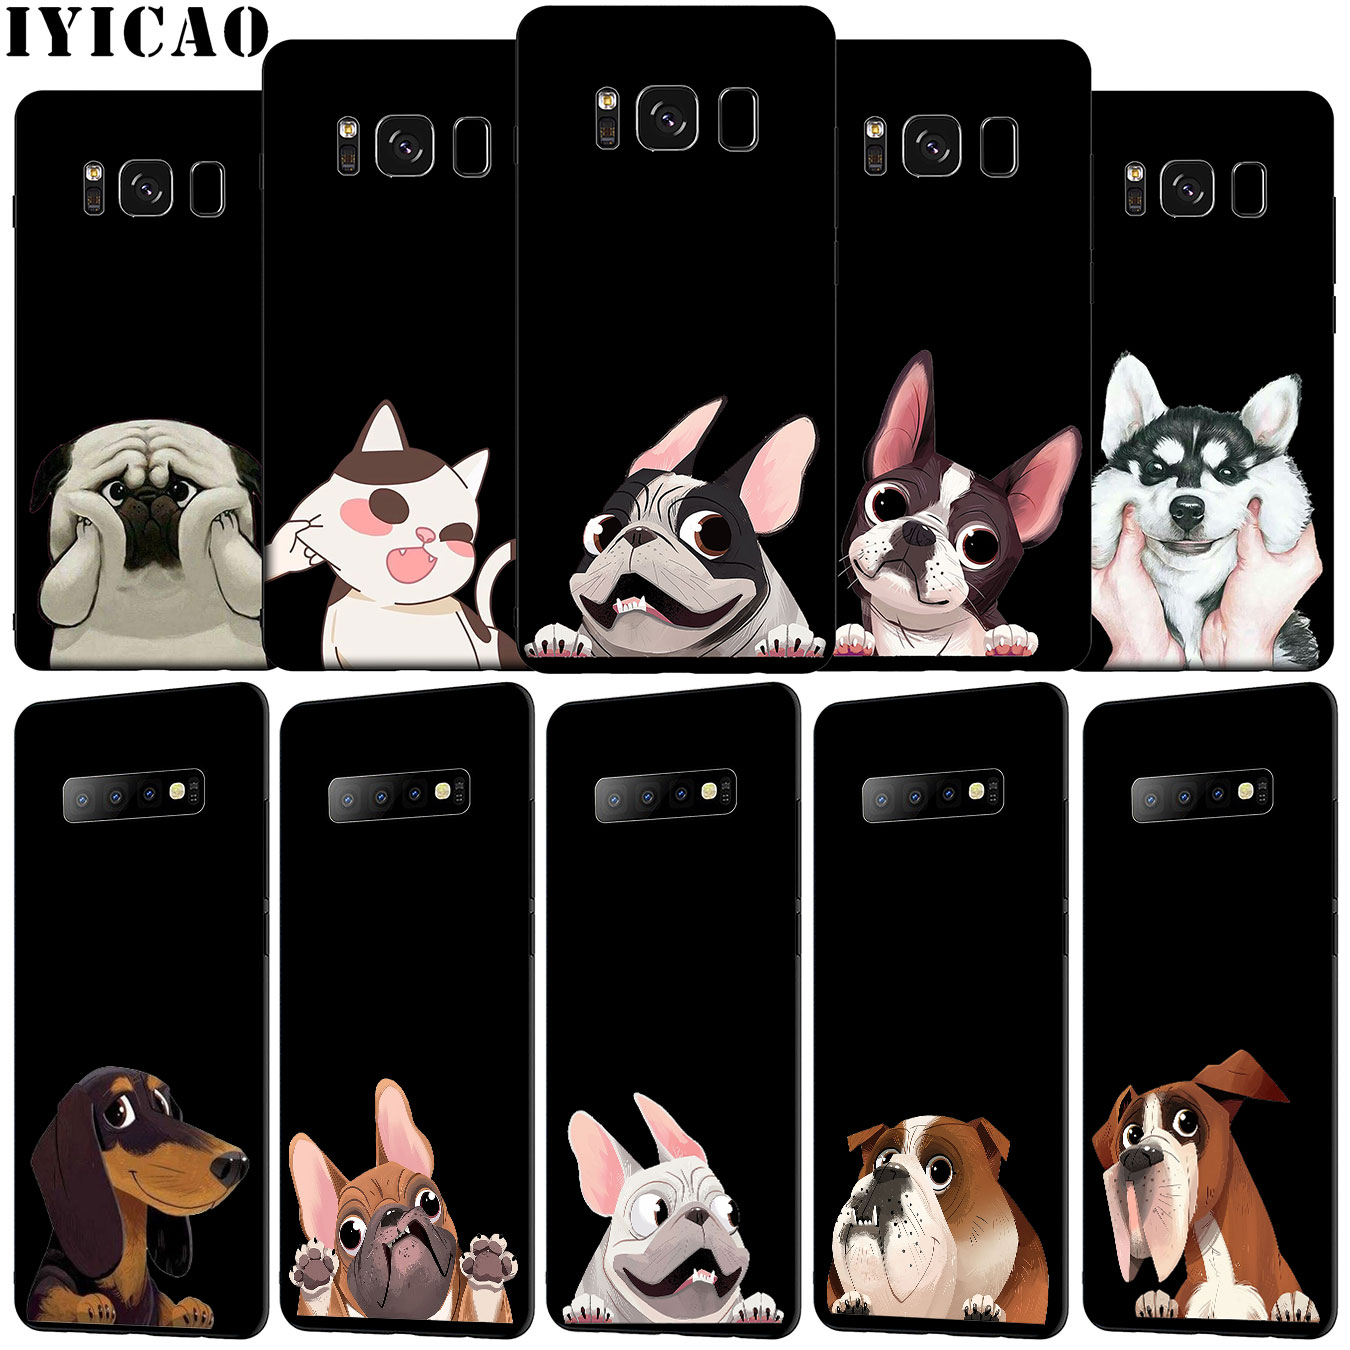 IYICAO lindo perro Pug divertido Bulldog corgi suave funda de teléfono para Samsung Galaxy S20 Ultra S10e S9 S8 Plus S7 S6 Edge S10 Lite